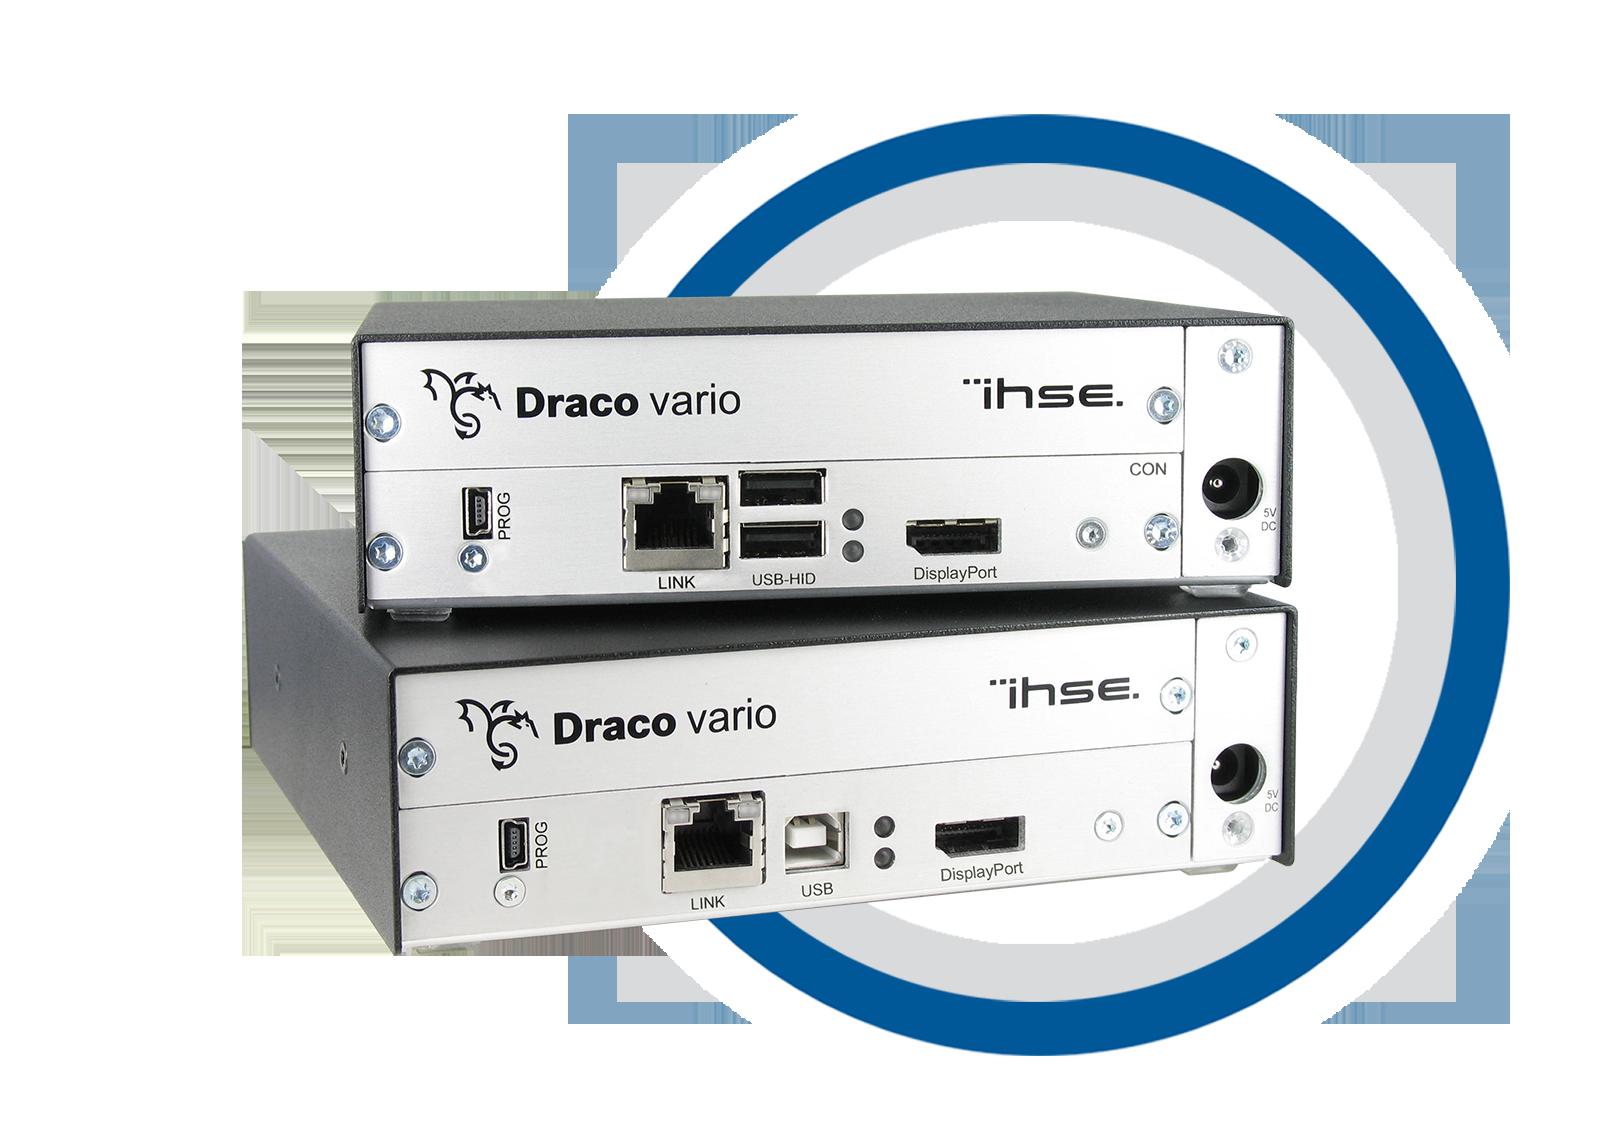 Draco Vario CON-Unit, Cat X, 1 Monitor DisplayPort Single Link and USB-HID  - R483-1PHC